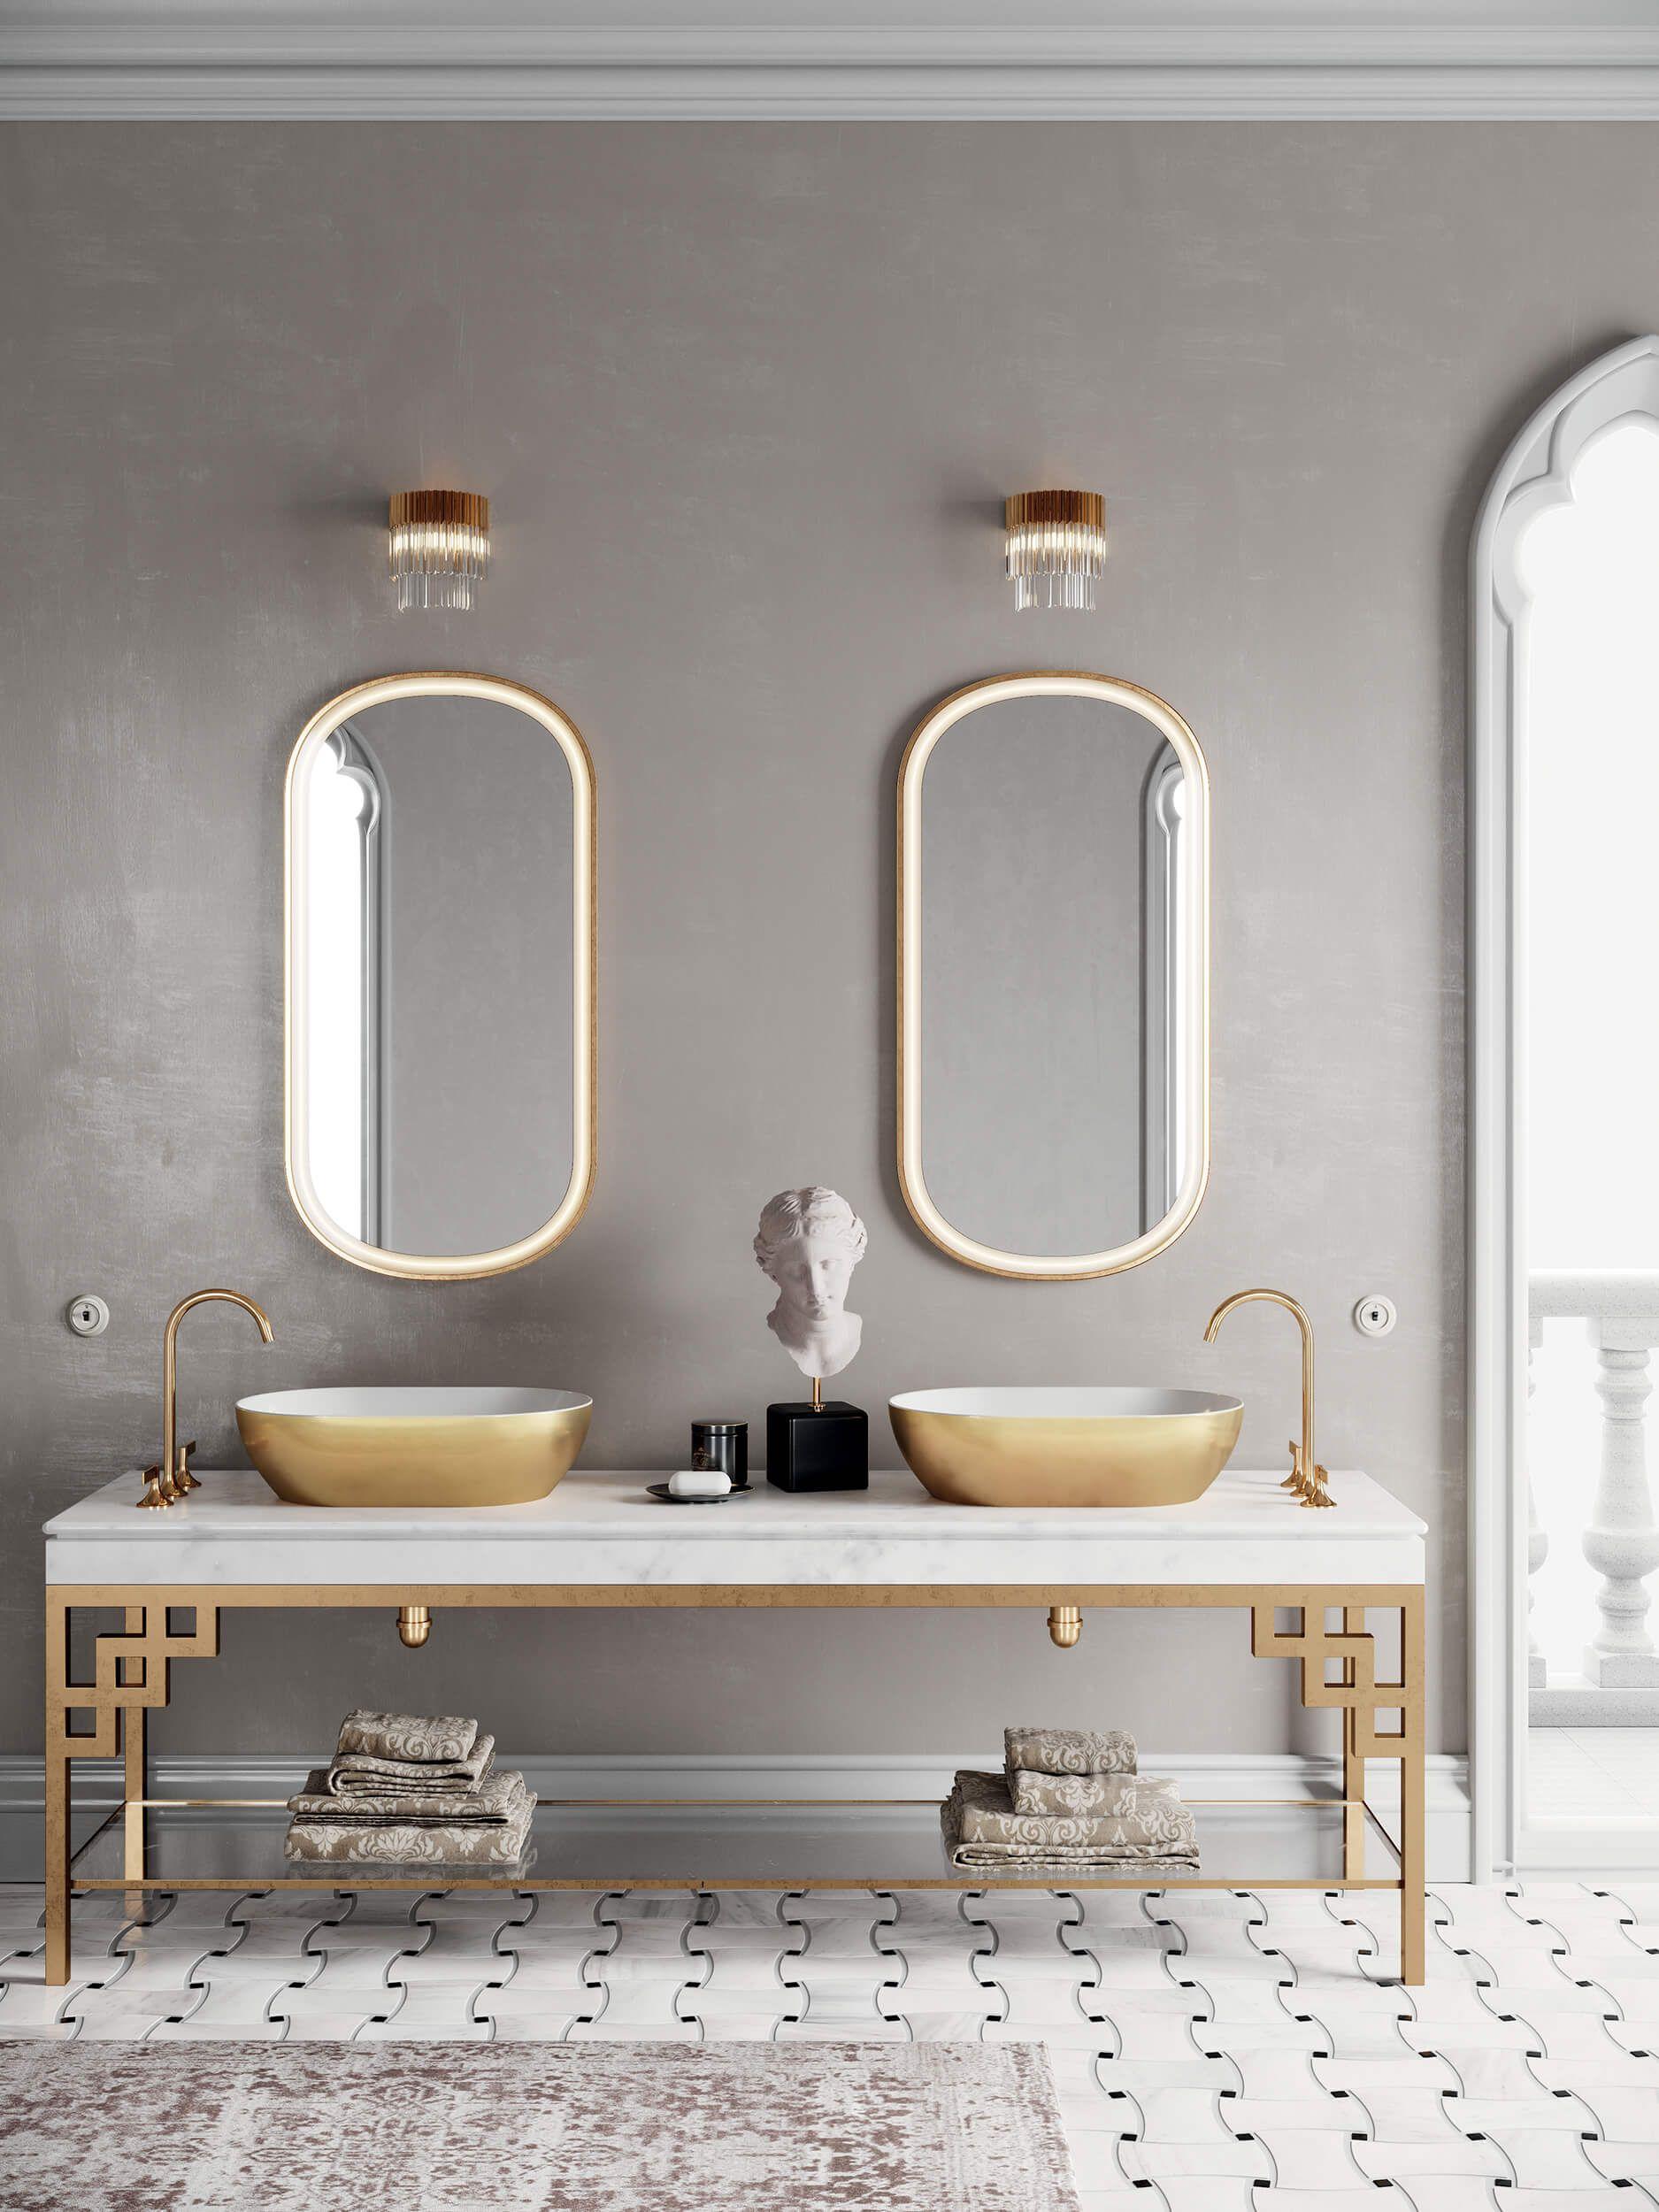 Badezimmer planen: Tipps & Tricks | BAD Ideen Deko ...